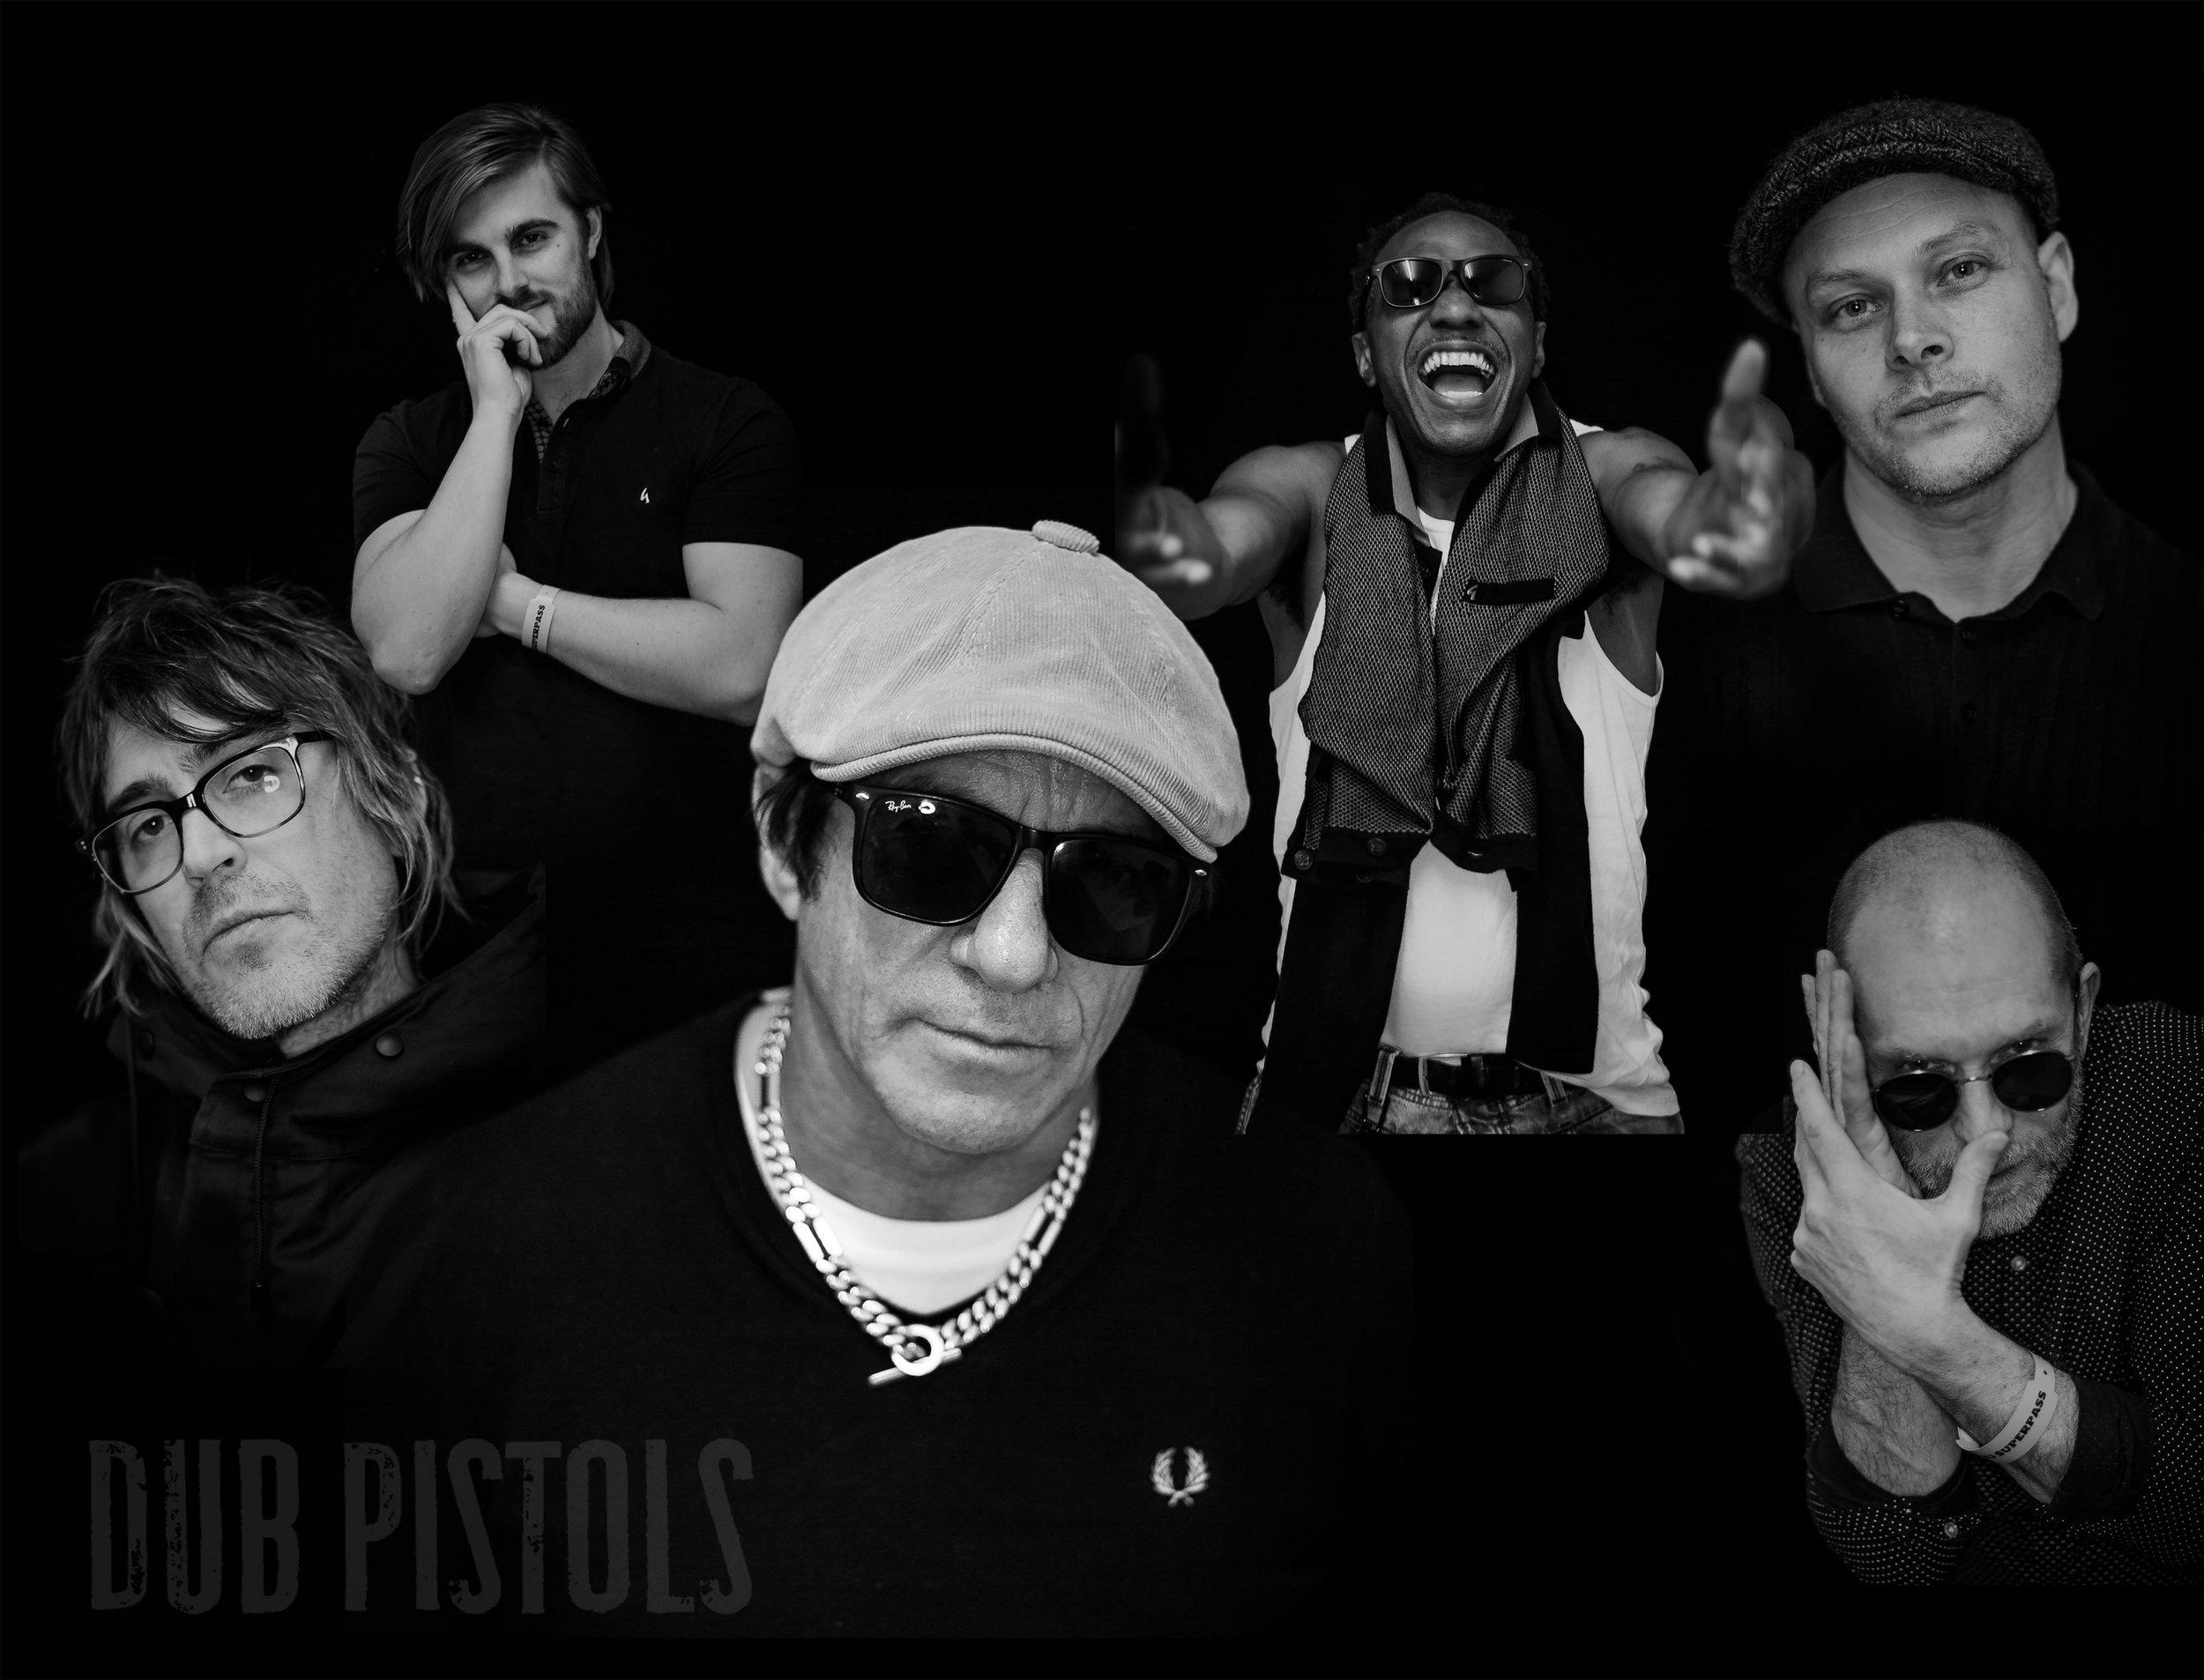 Dub Pistols pic.jpg